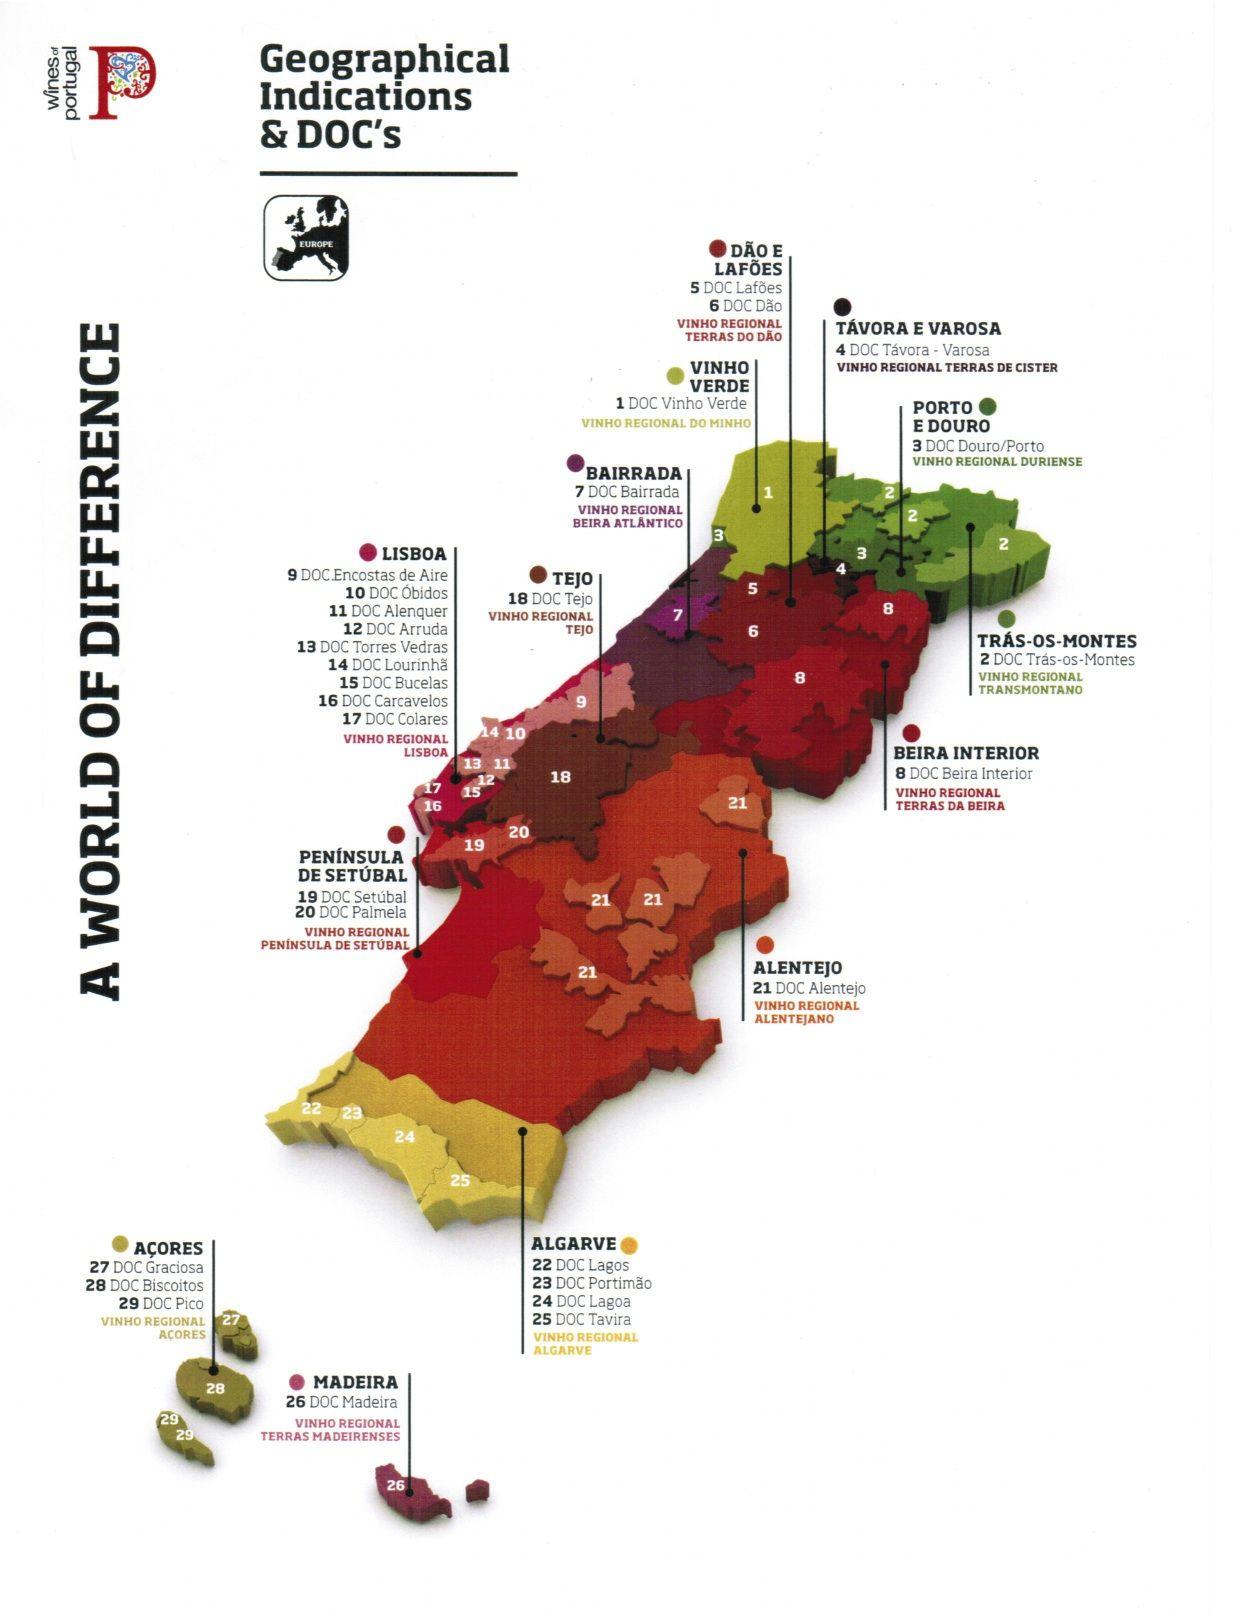 Guide To Wine Bottle Sizes Wine Folly In 2020 Wine Folly Wine Bottle Sizes Wine Recipes